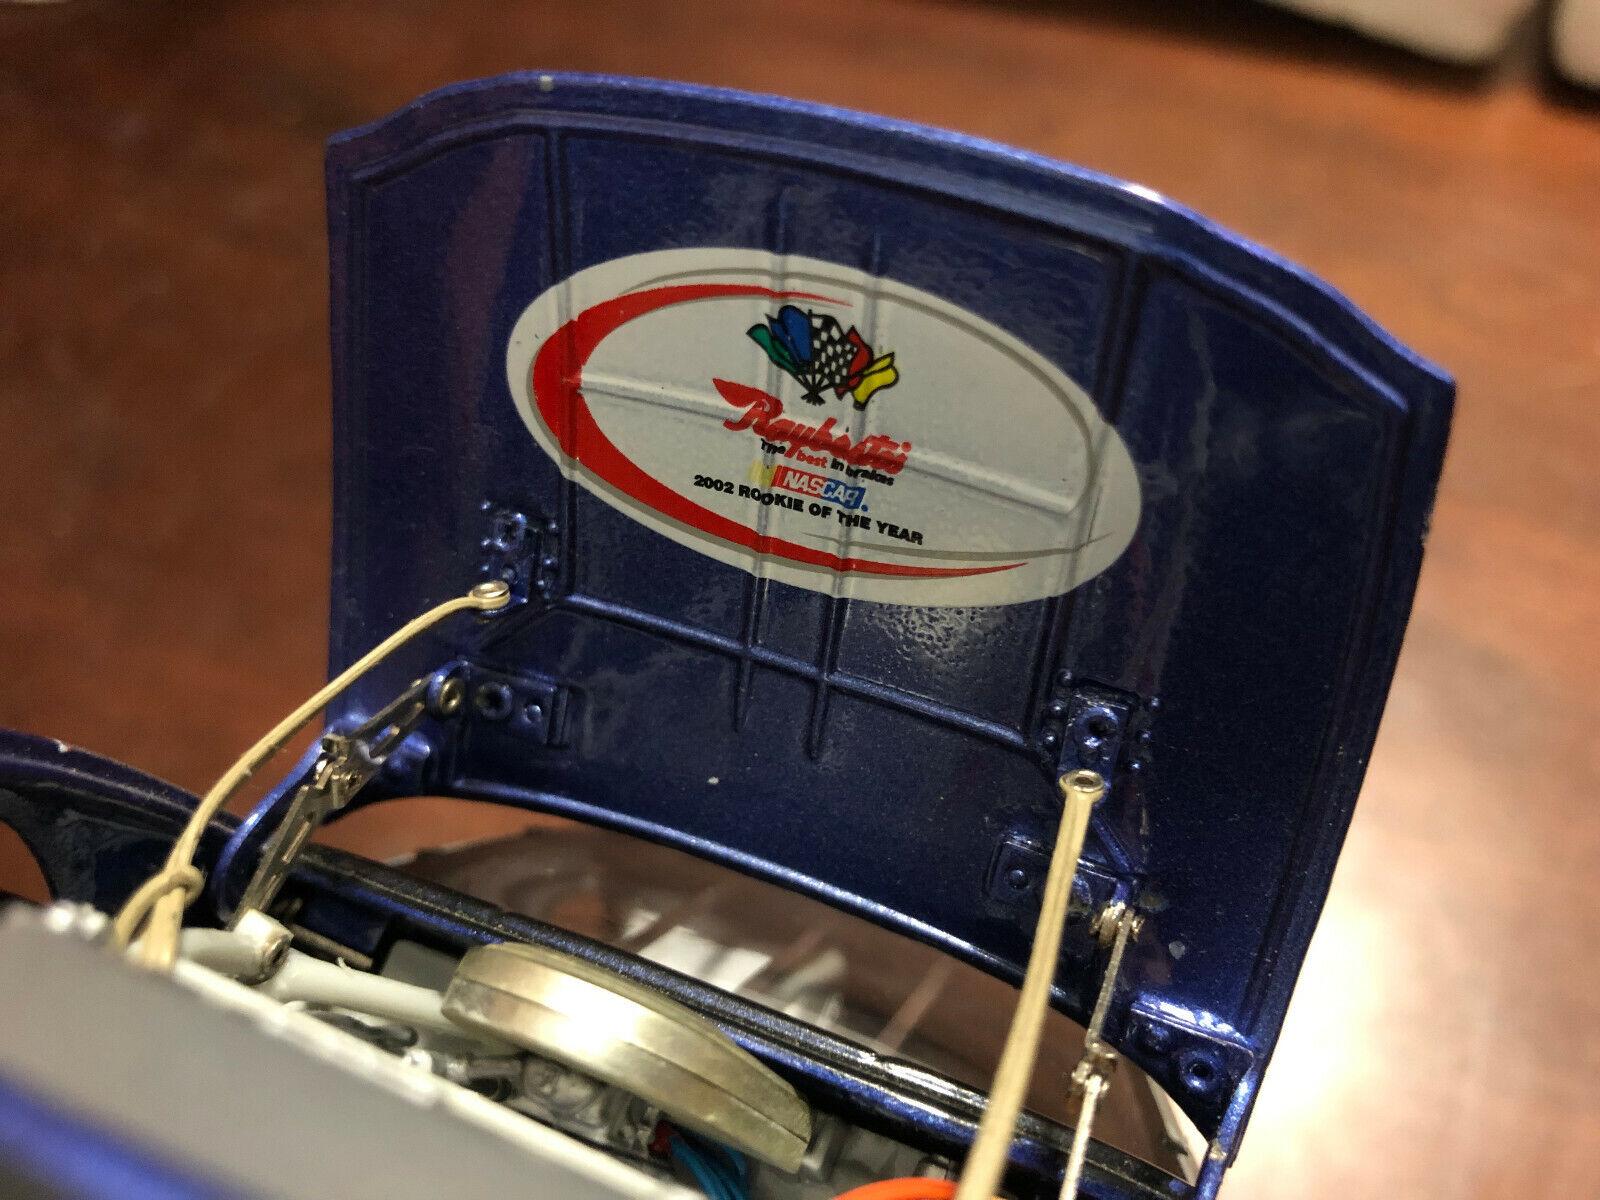 2002 Jimmie Johnson Roy novato del año Lowes DNP Elite projootipo coche Grial Projoo